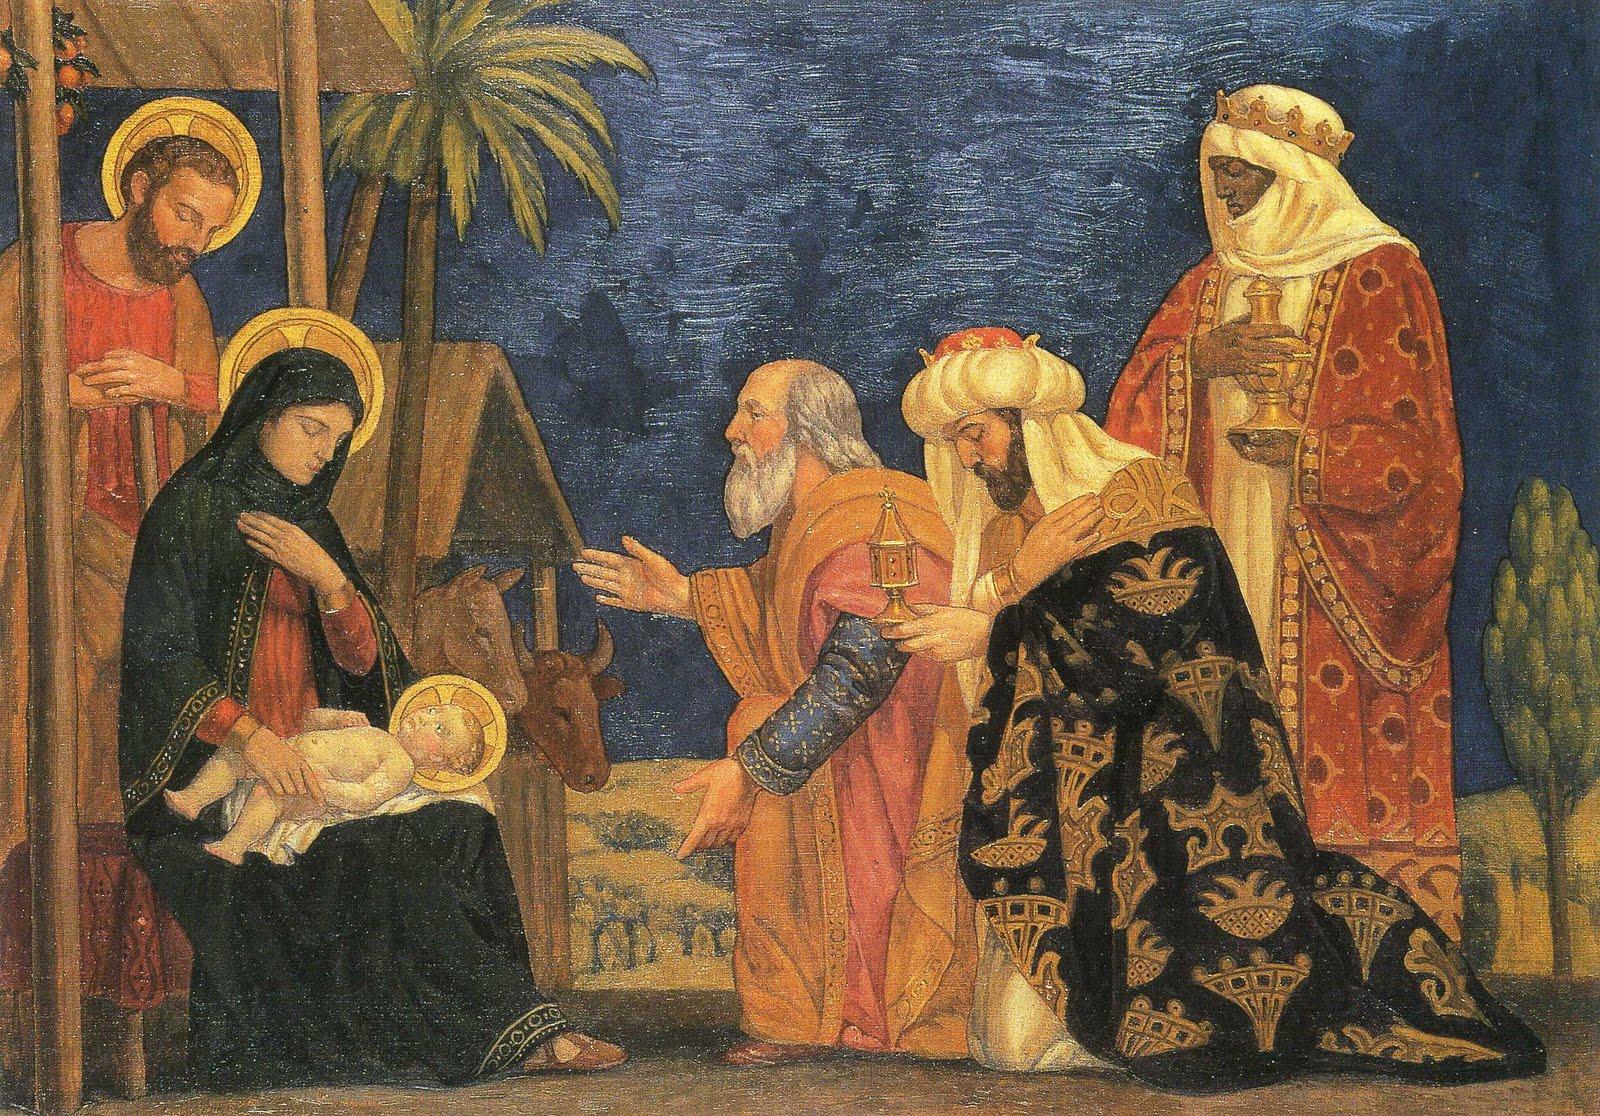 Three Wisemen litter - Velvet Dandy´s Balthazar of Saba  Velvet Dandy´s Melchior of Persian  Velvet Dandy´s Caspar of Tarsus